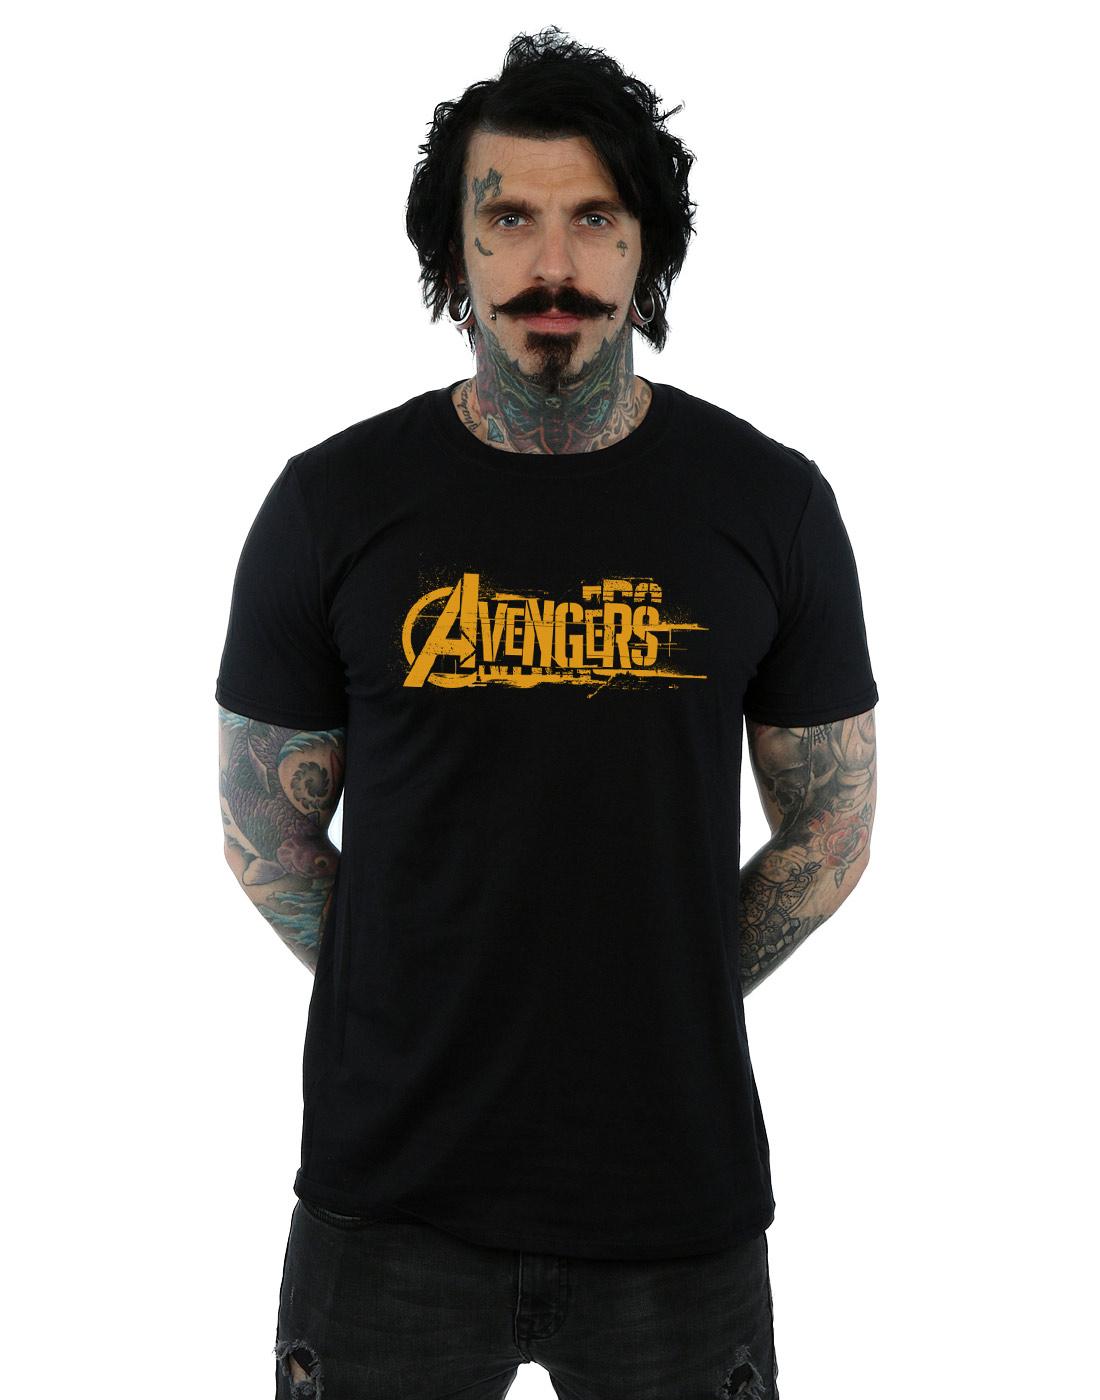 Avengers-Infinity-War-Men-039-s-T-Shirt-Official-New-Marvel-Merchandise thumbnail 25